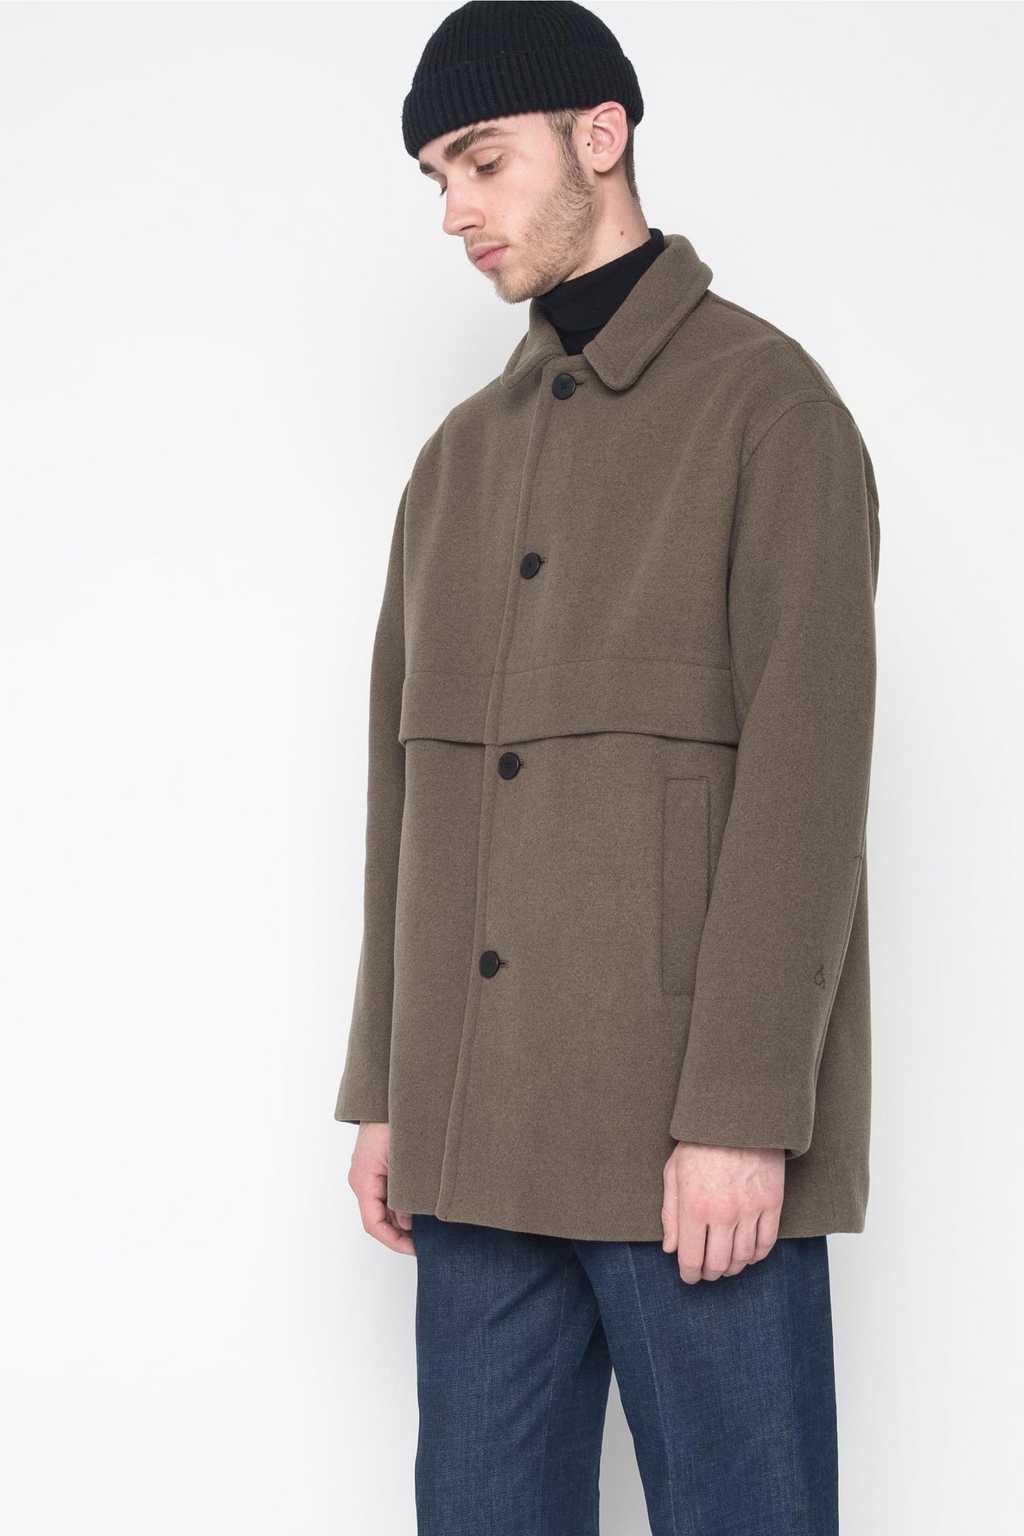 Coat 4134 Olive 2